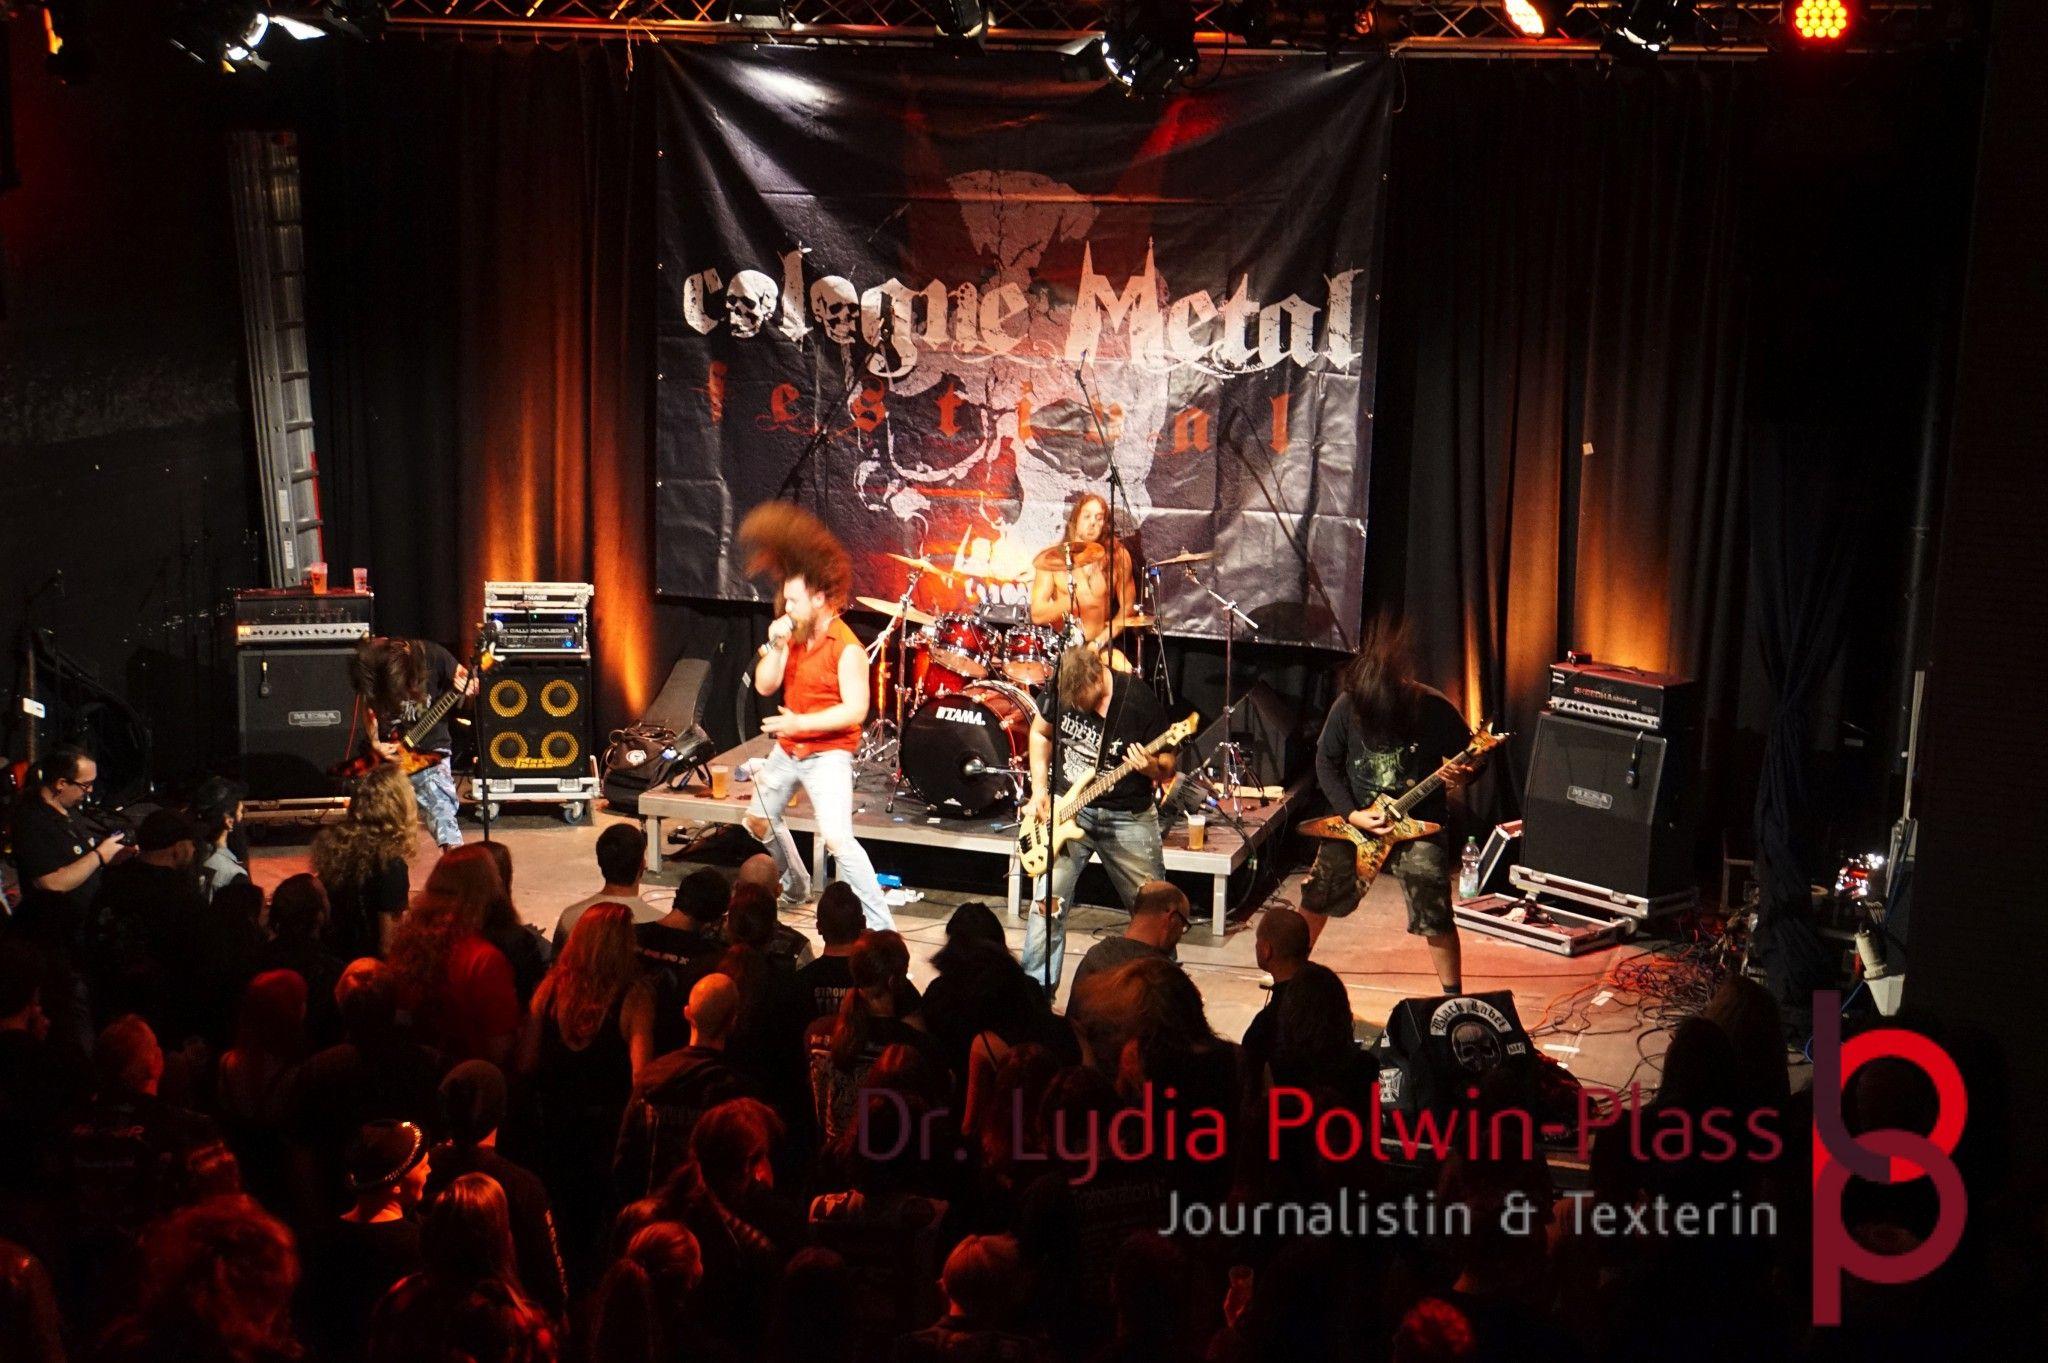 Cologne Metal Festival - Klein aber fein - MIT FOTOSTRECKE